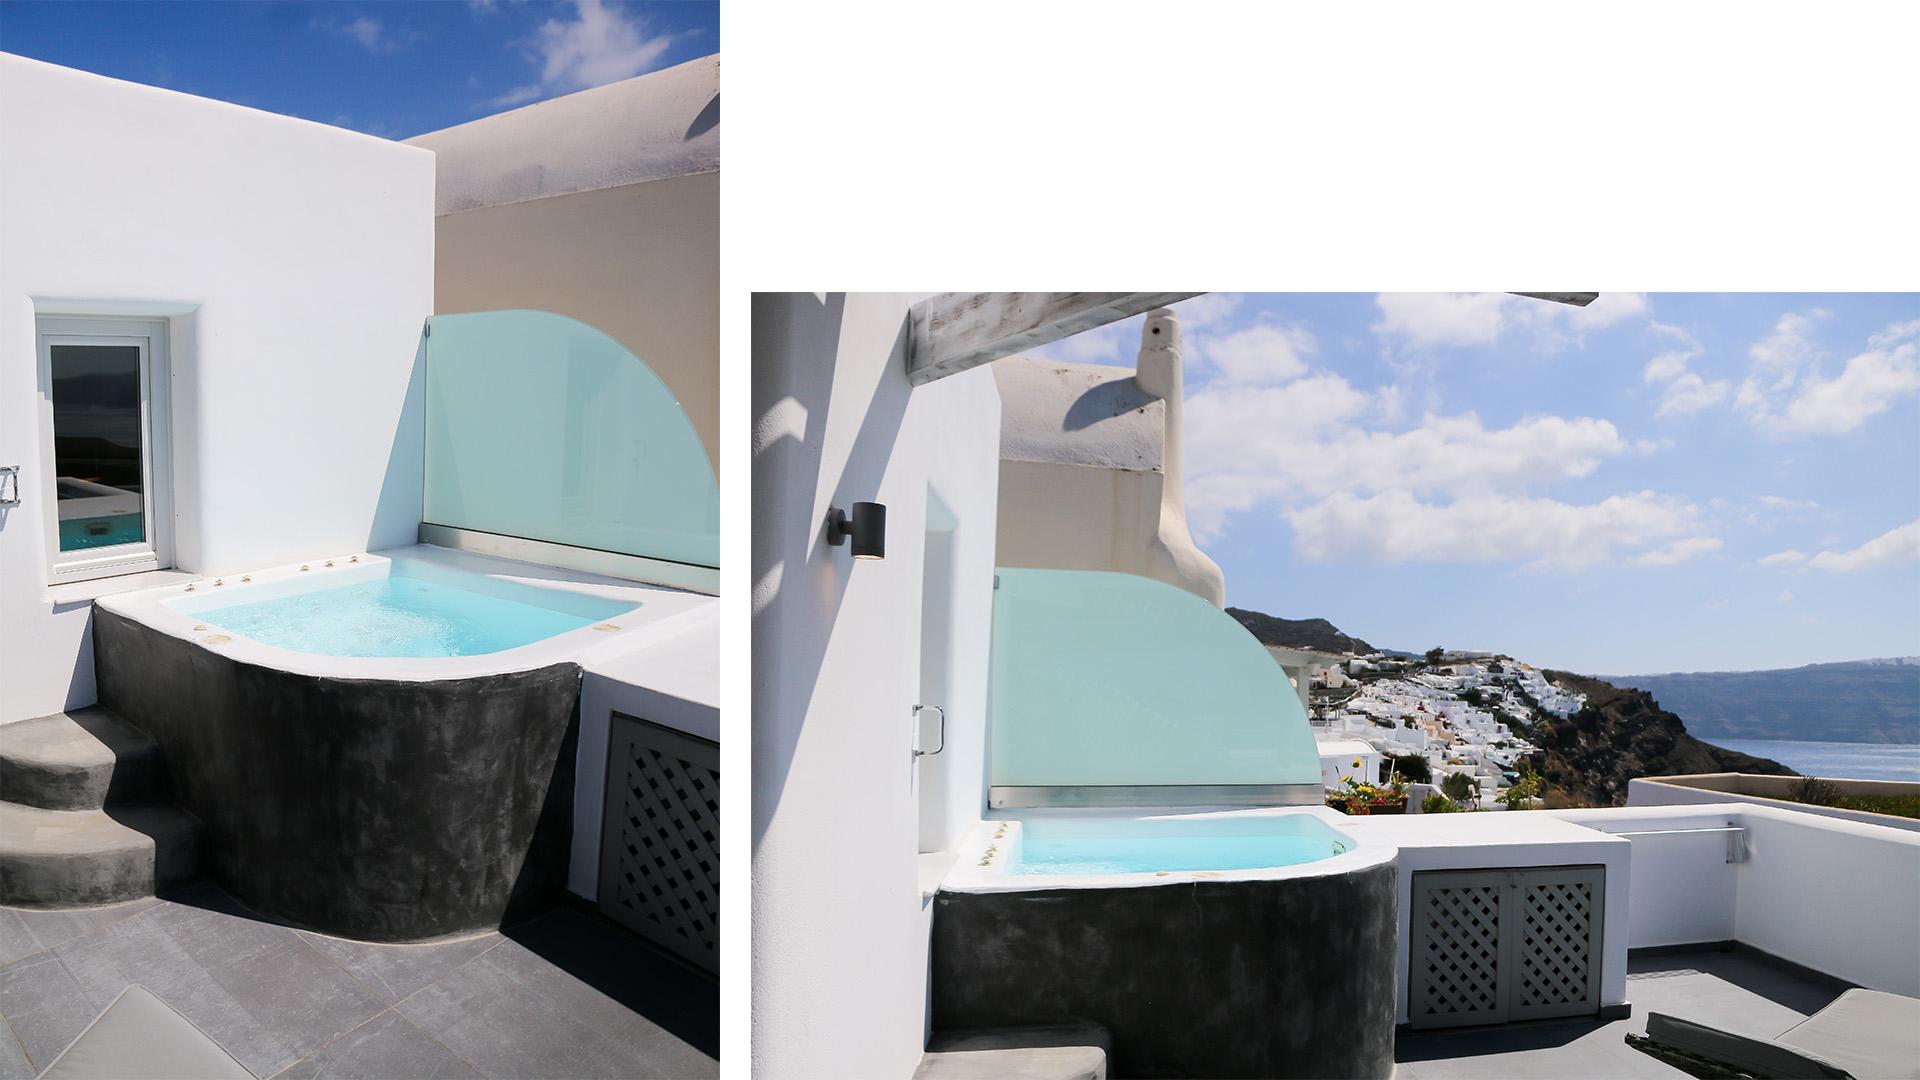 jacuzzi-spa-bain-à-remous-oia-santorin-hotel